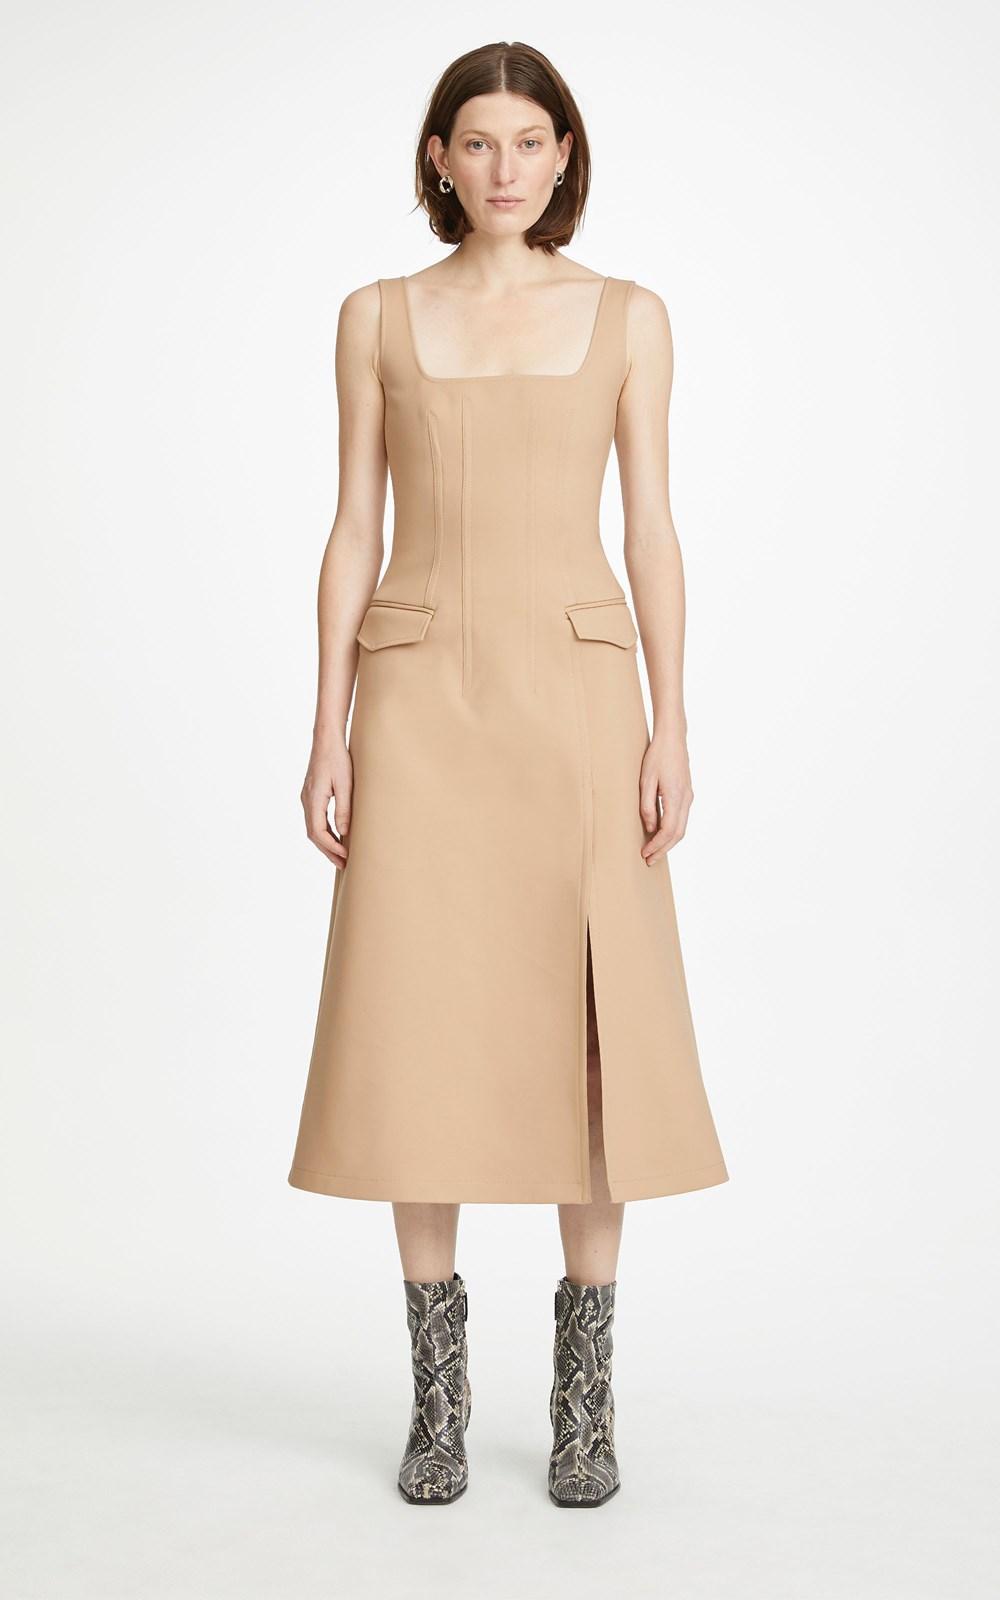 Dresses | FRAME DRESS